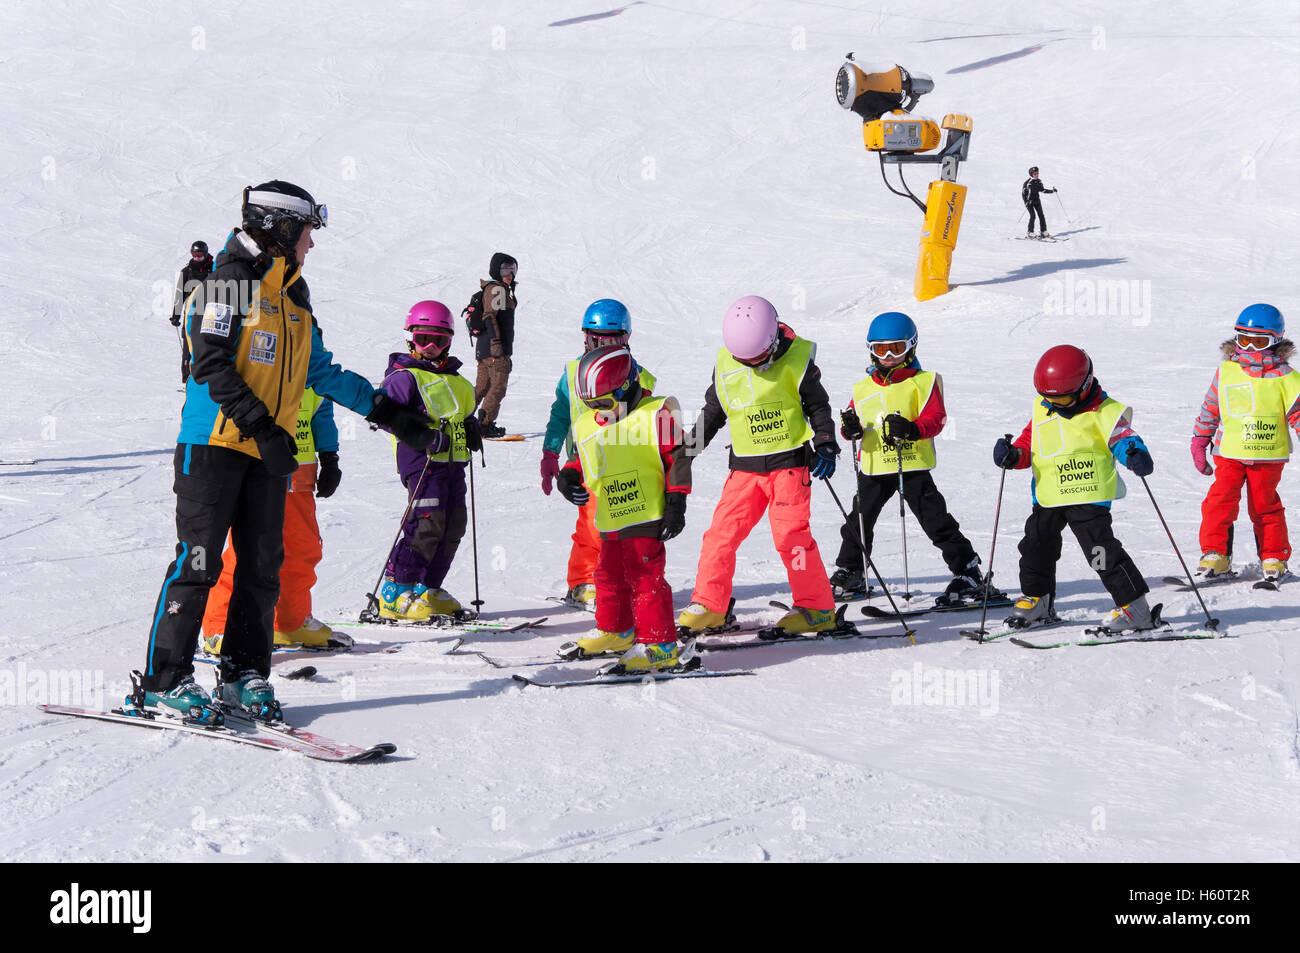 SOLDEN, AUSTRIA, MARCH 4, 2016: Ski school for children in Solden ski resort in Austrian Alps Stock Photo